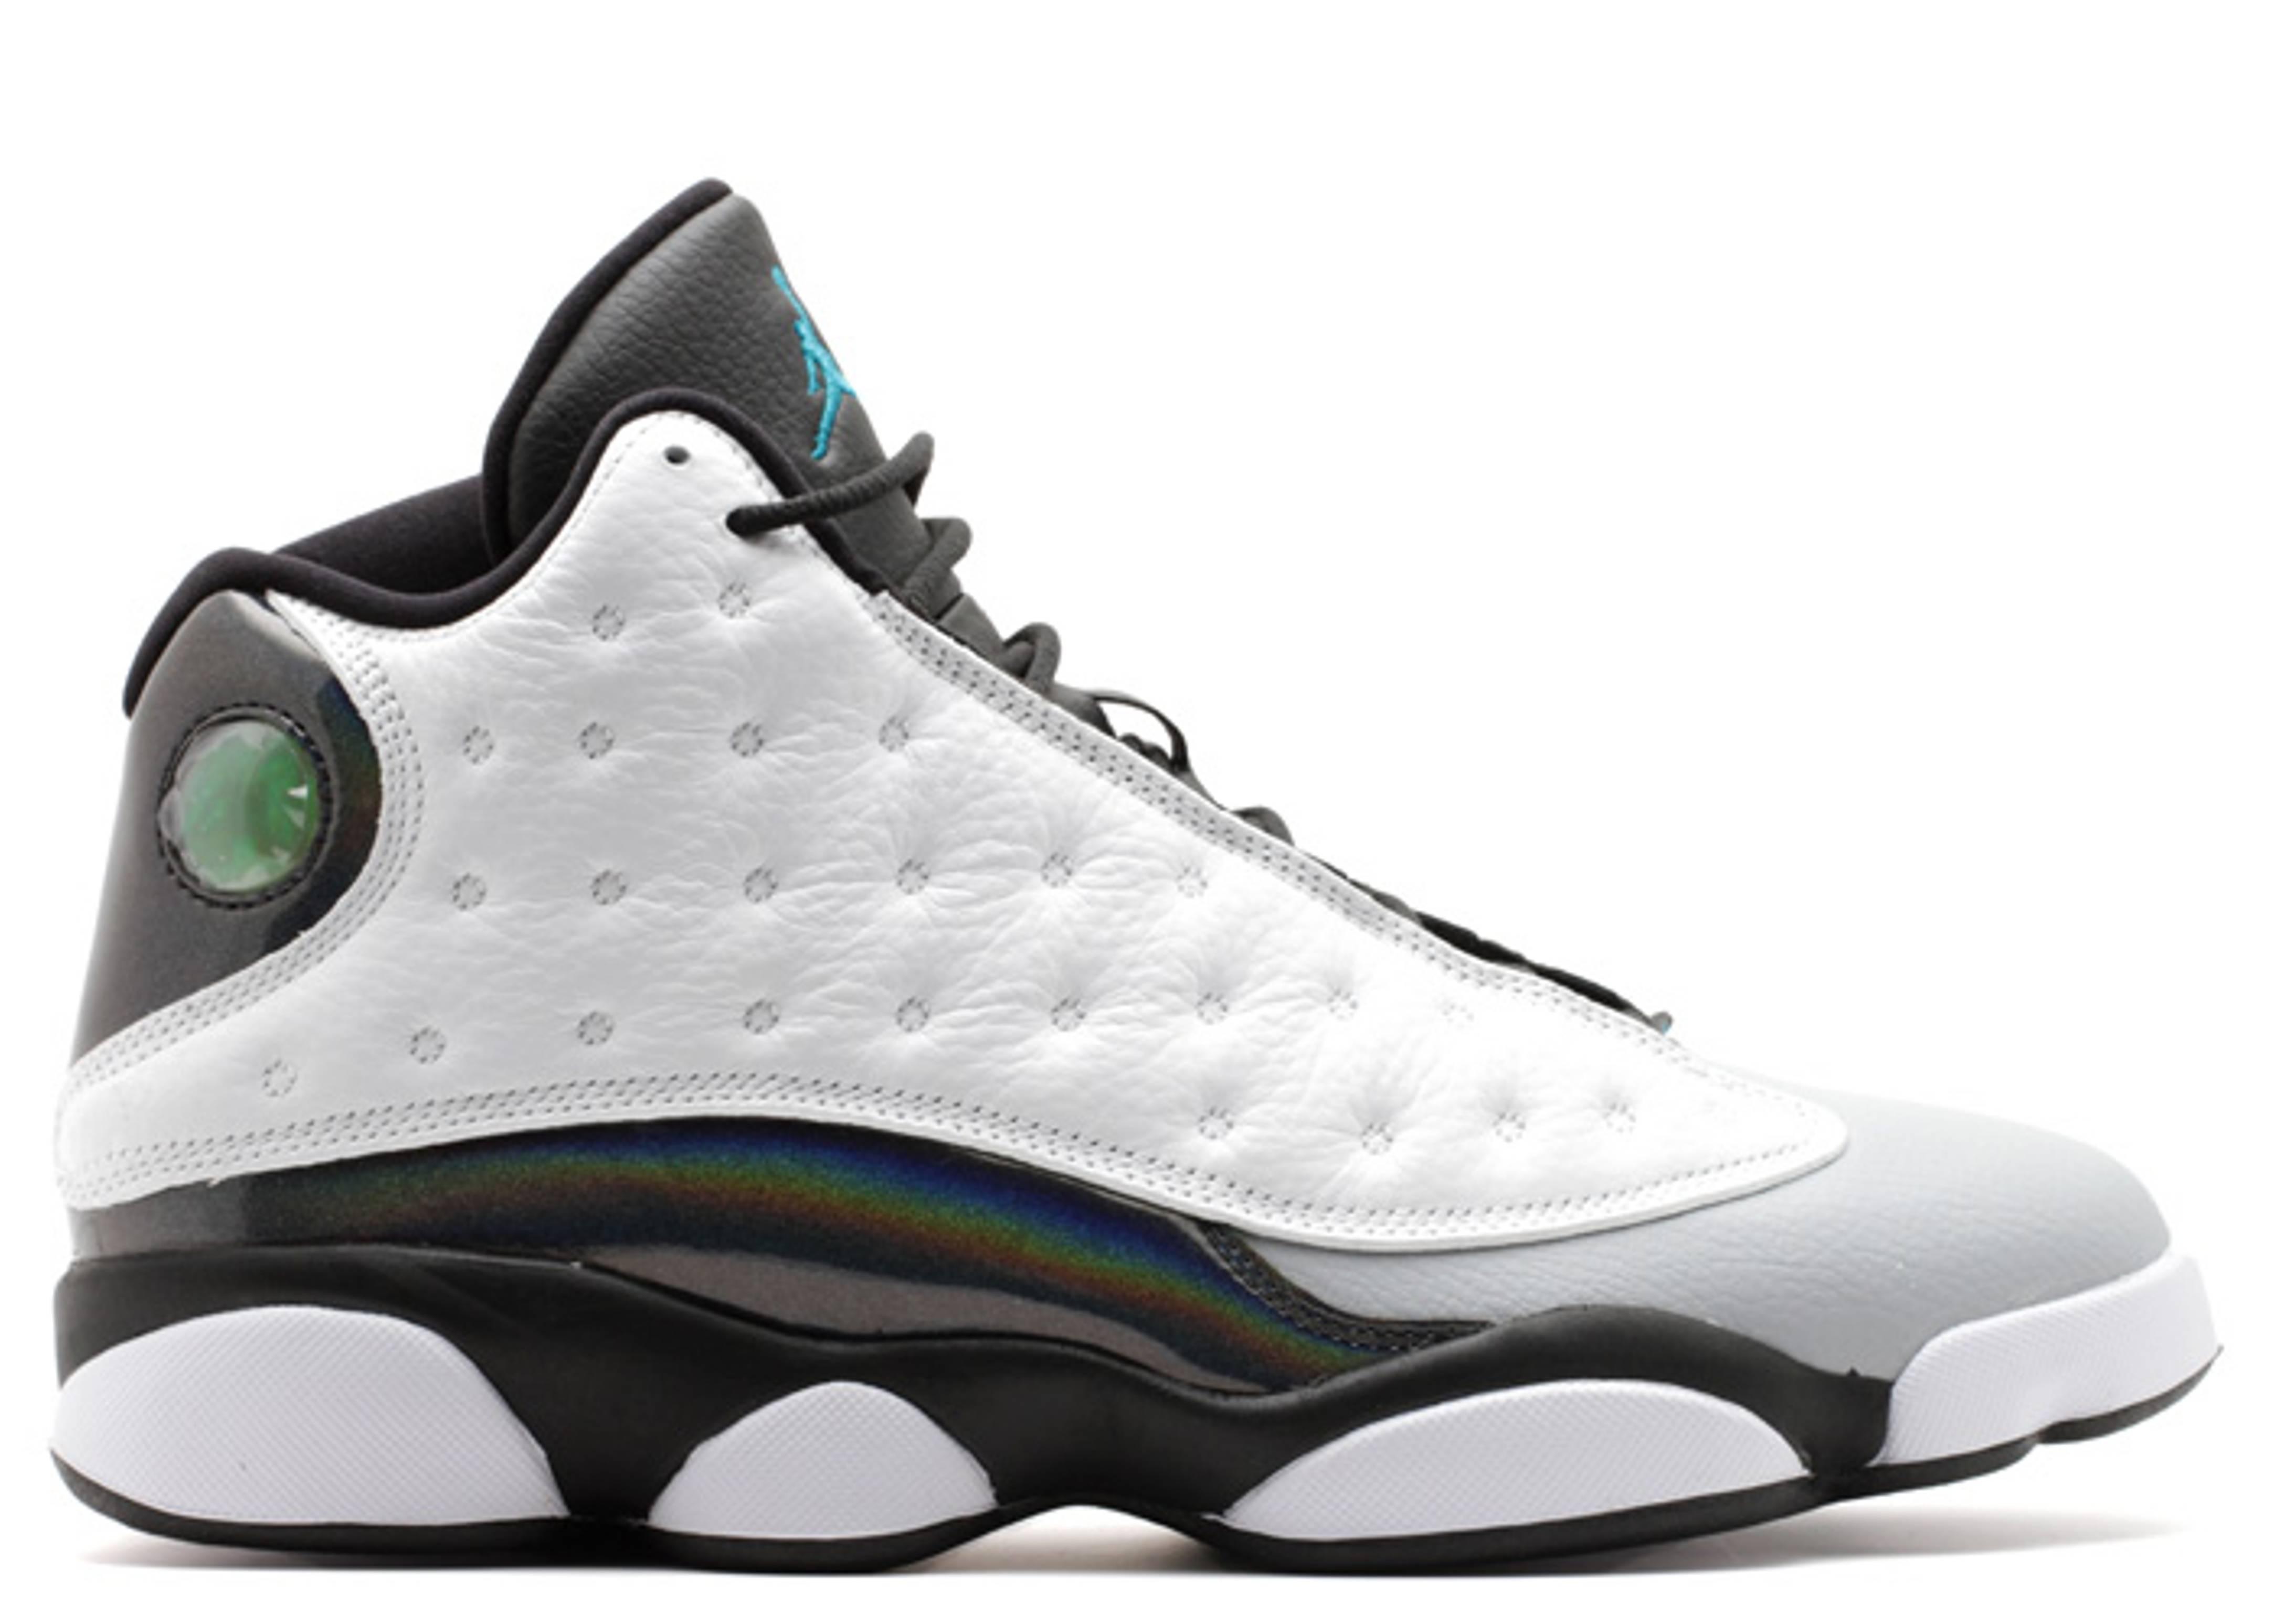 separation shoes 8a723 0e95f air jordan 13 white black